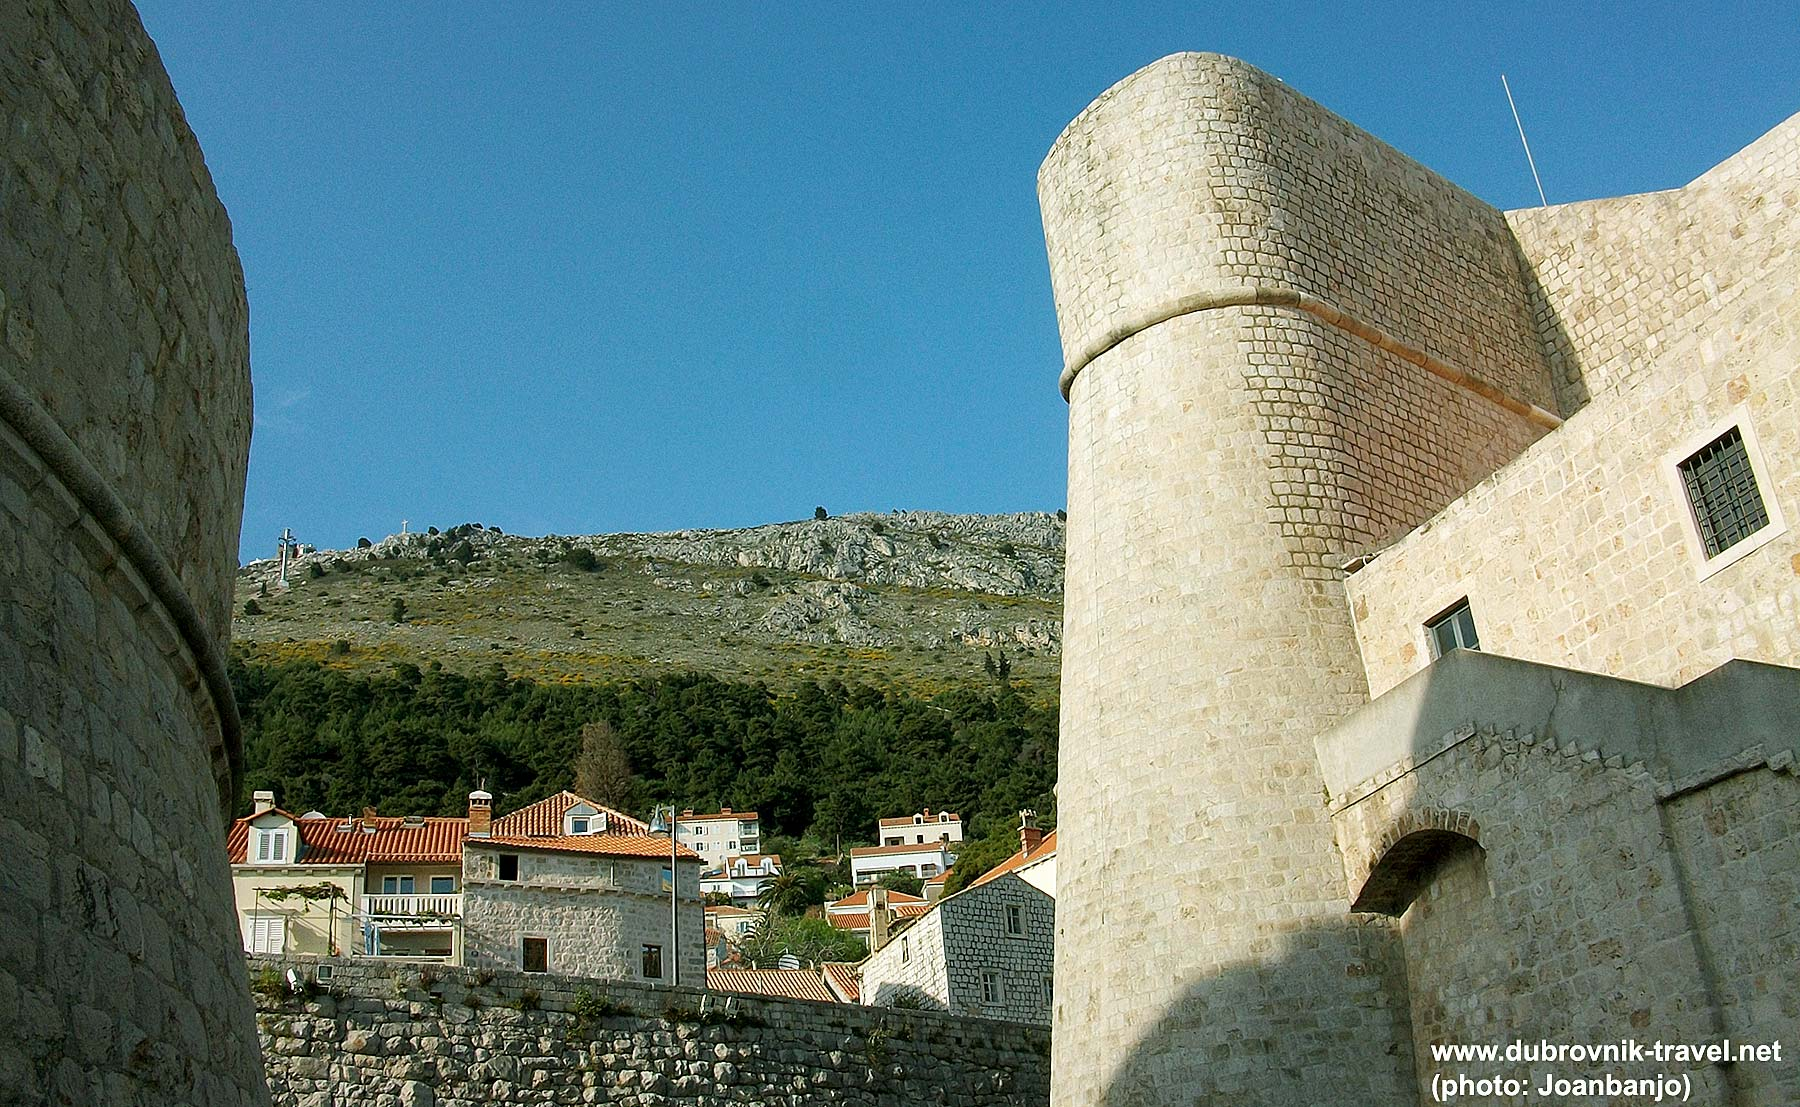 Western side of Revelin Fortress in Dubrovnik